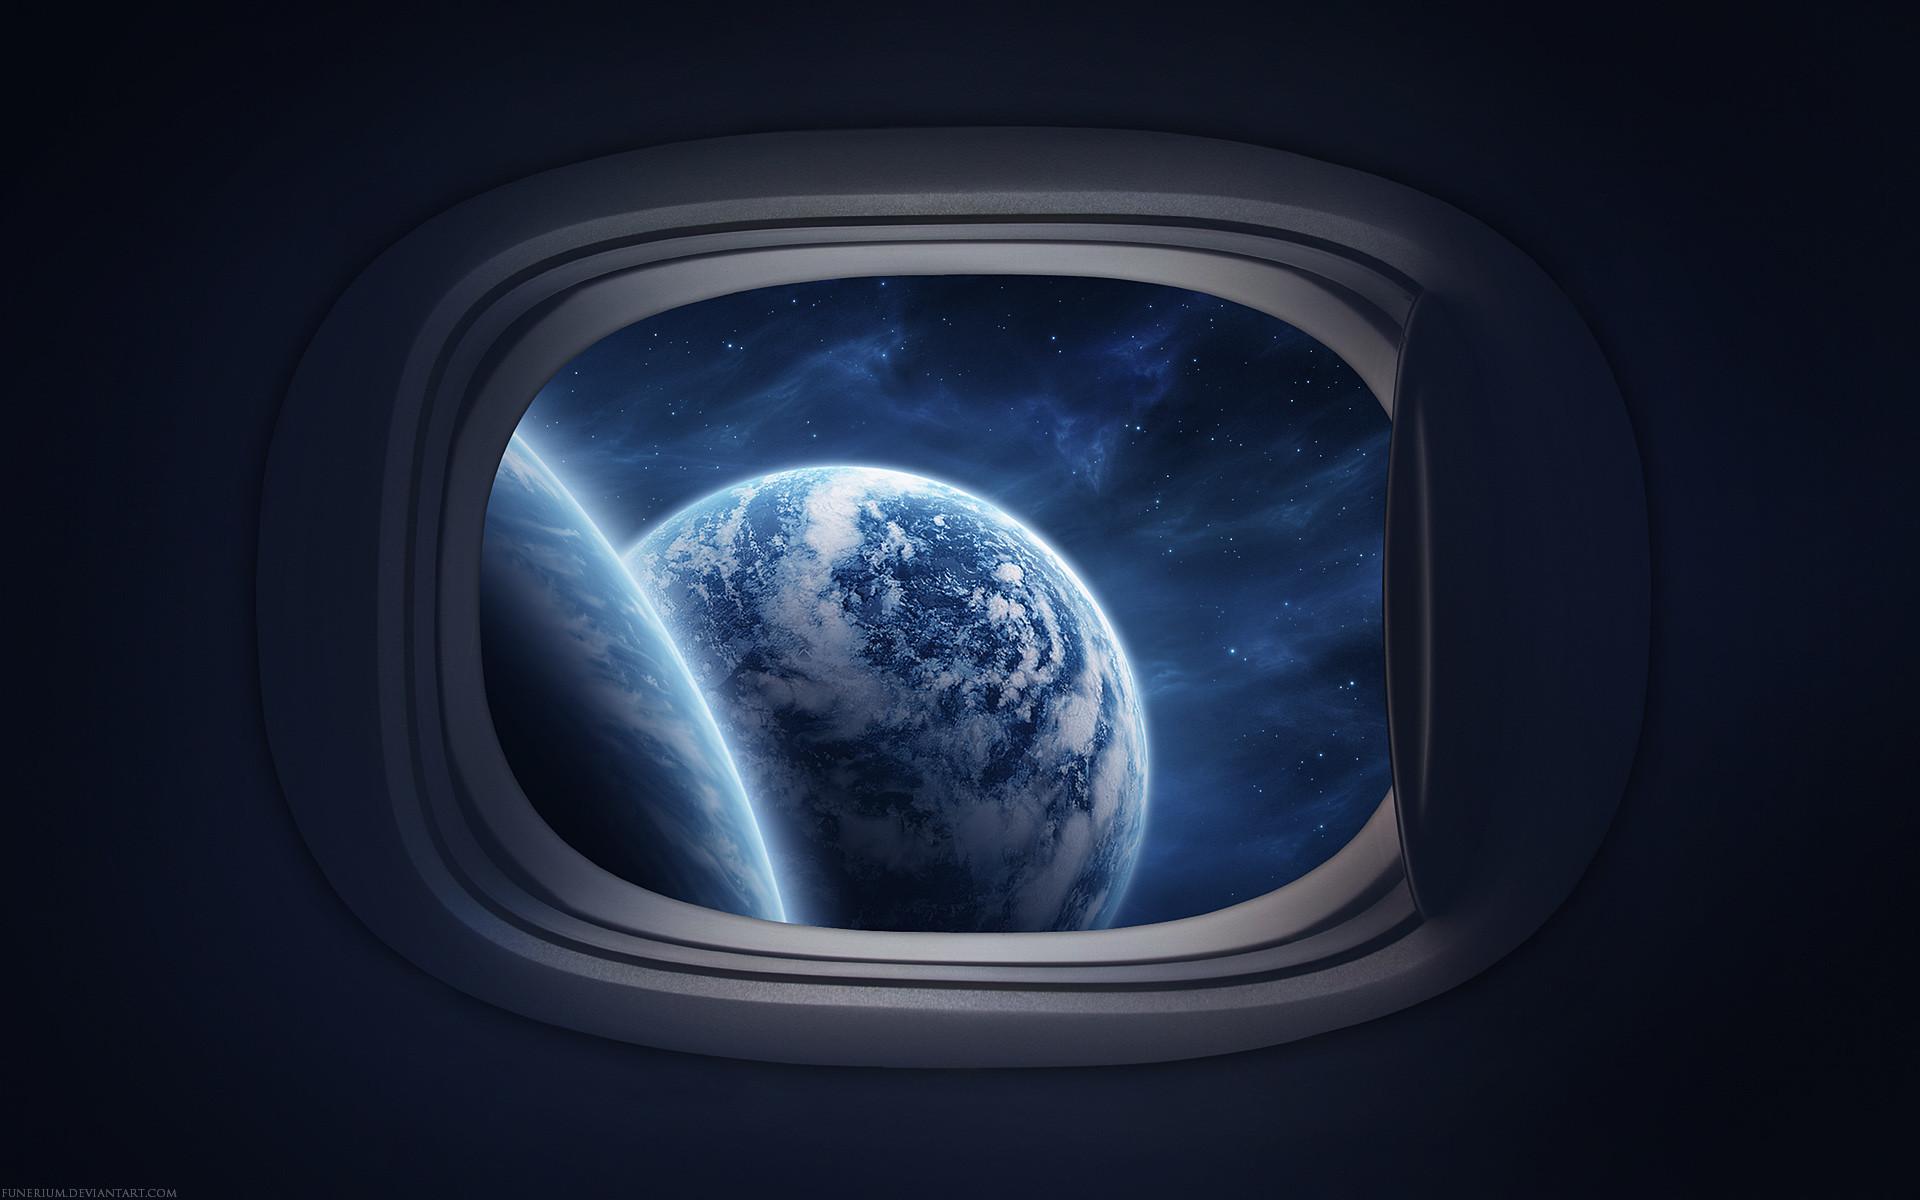 Inside spaceship wallpaper wallpapertag - Spaceship wallpaper ...